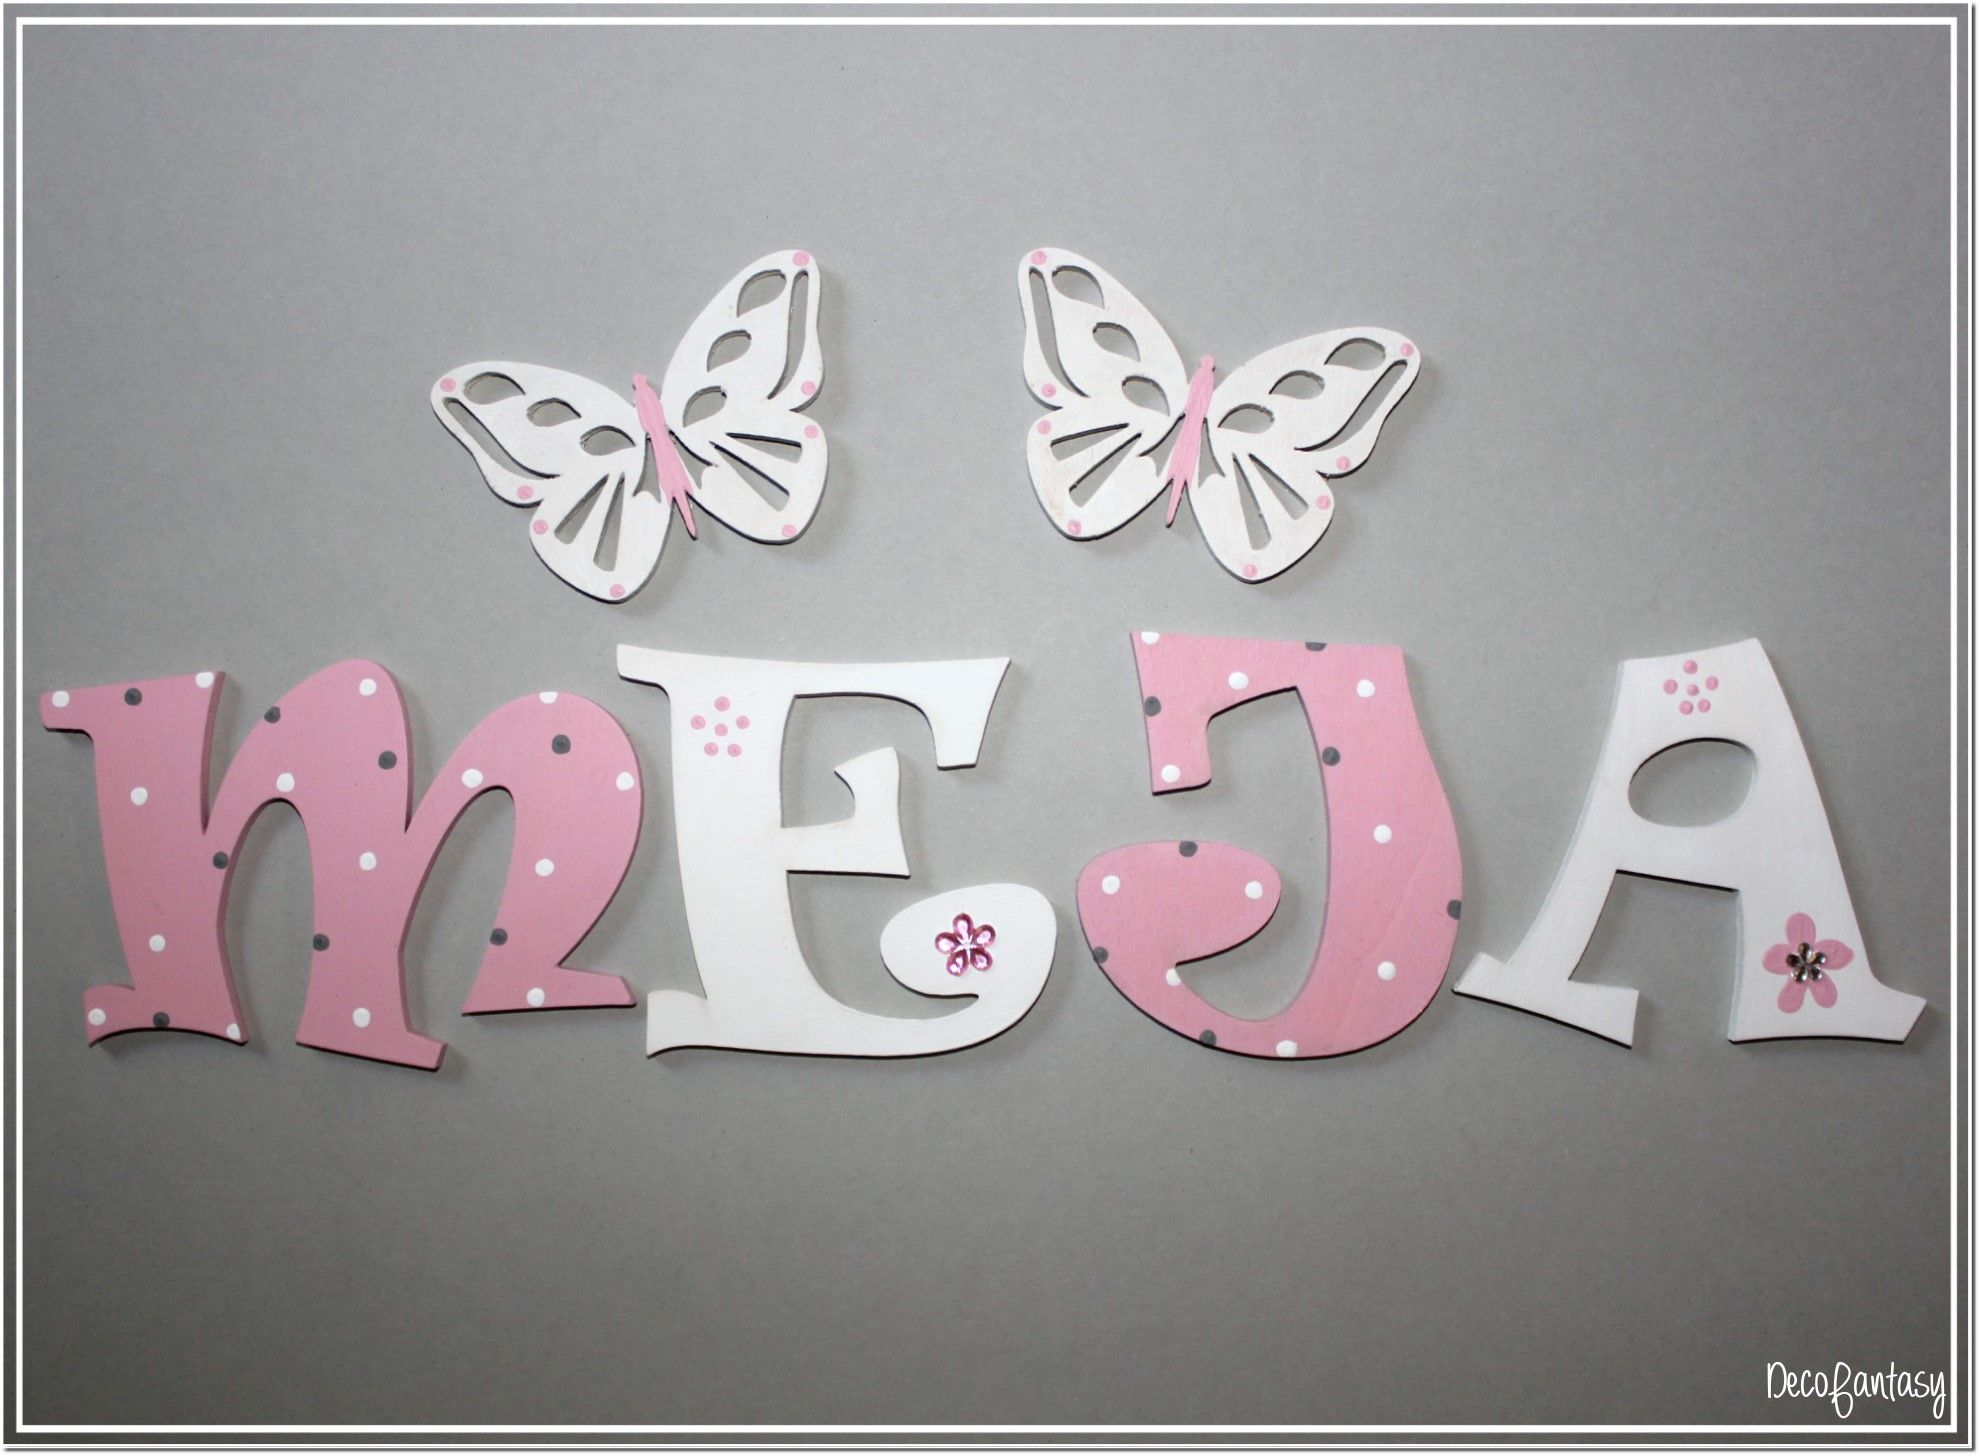 Holzbuchstaben 8 cm Kinderzimmer Holzbuchstaben